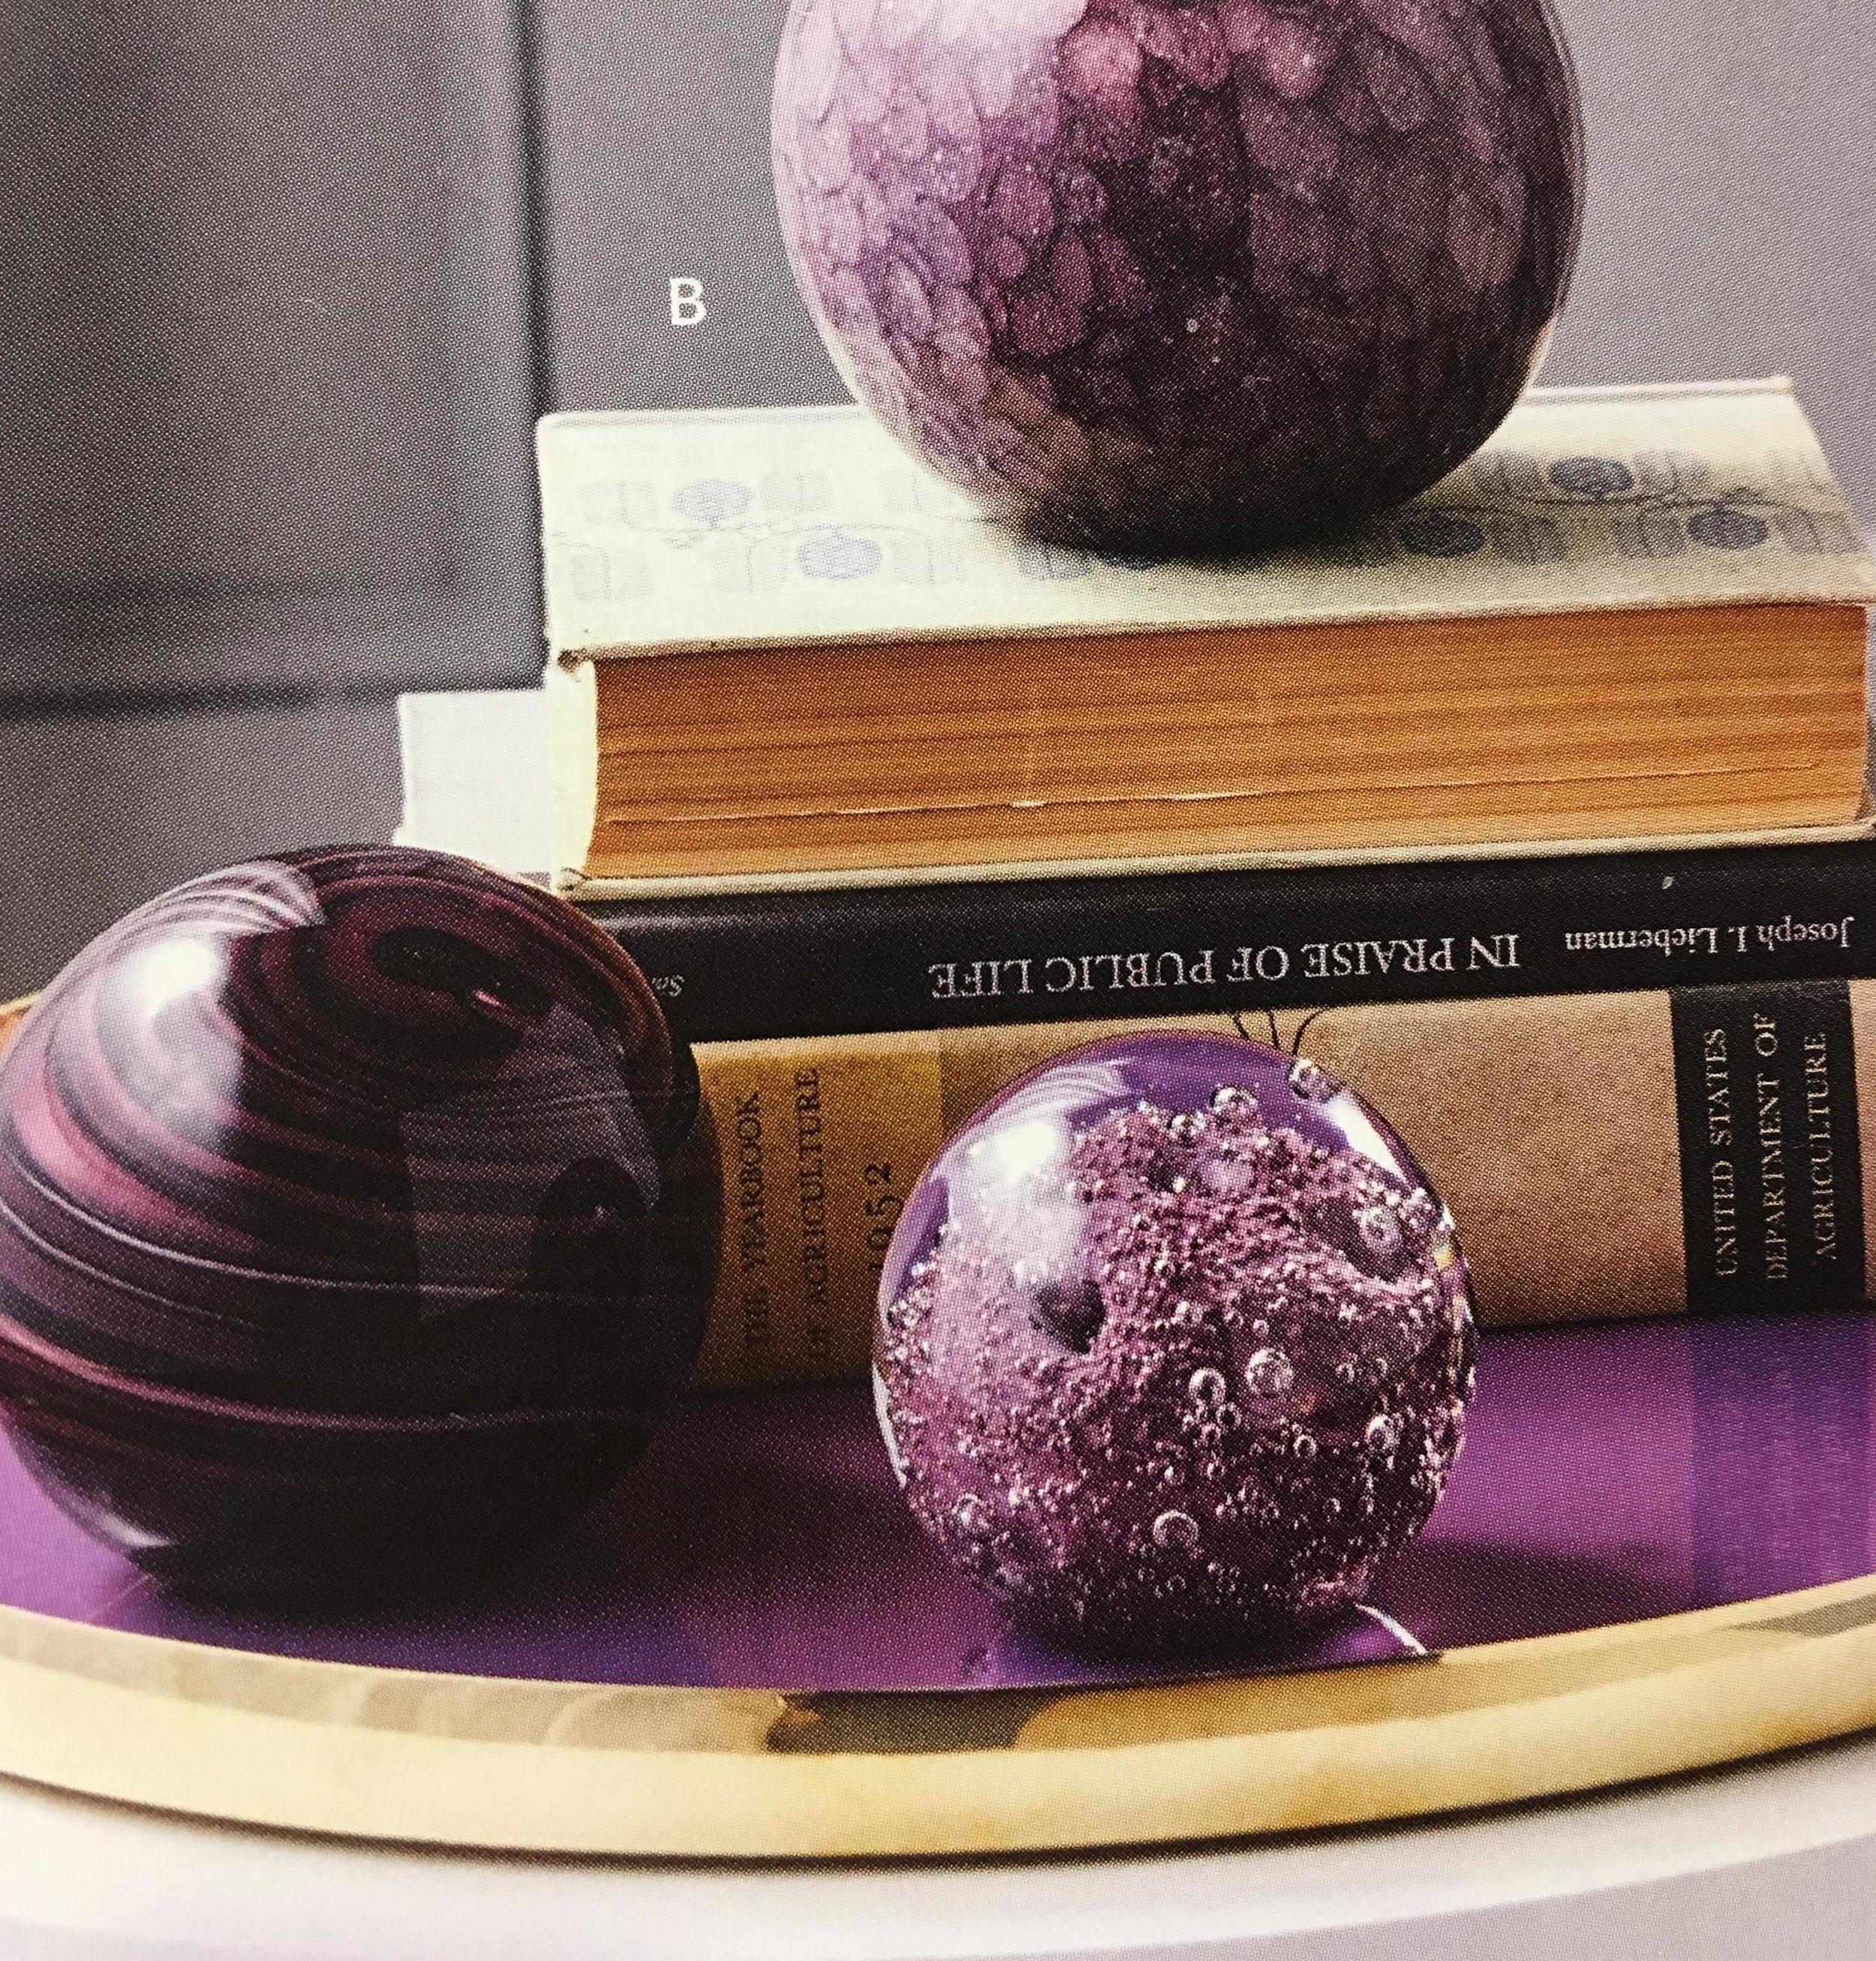 Order Number. 10. Decorative glass balls (purple)